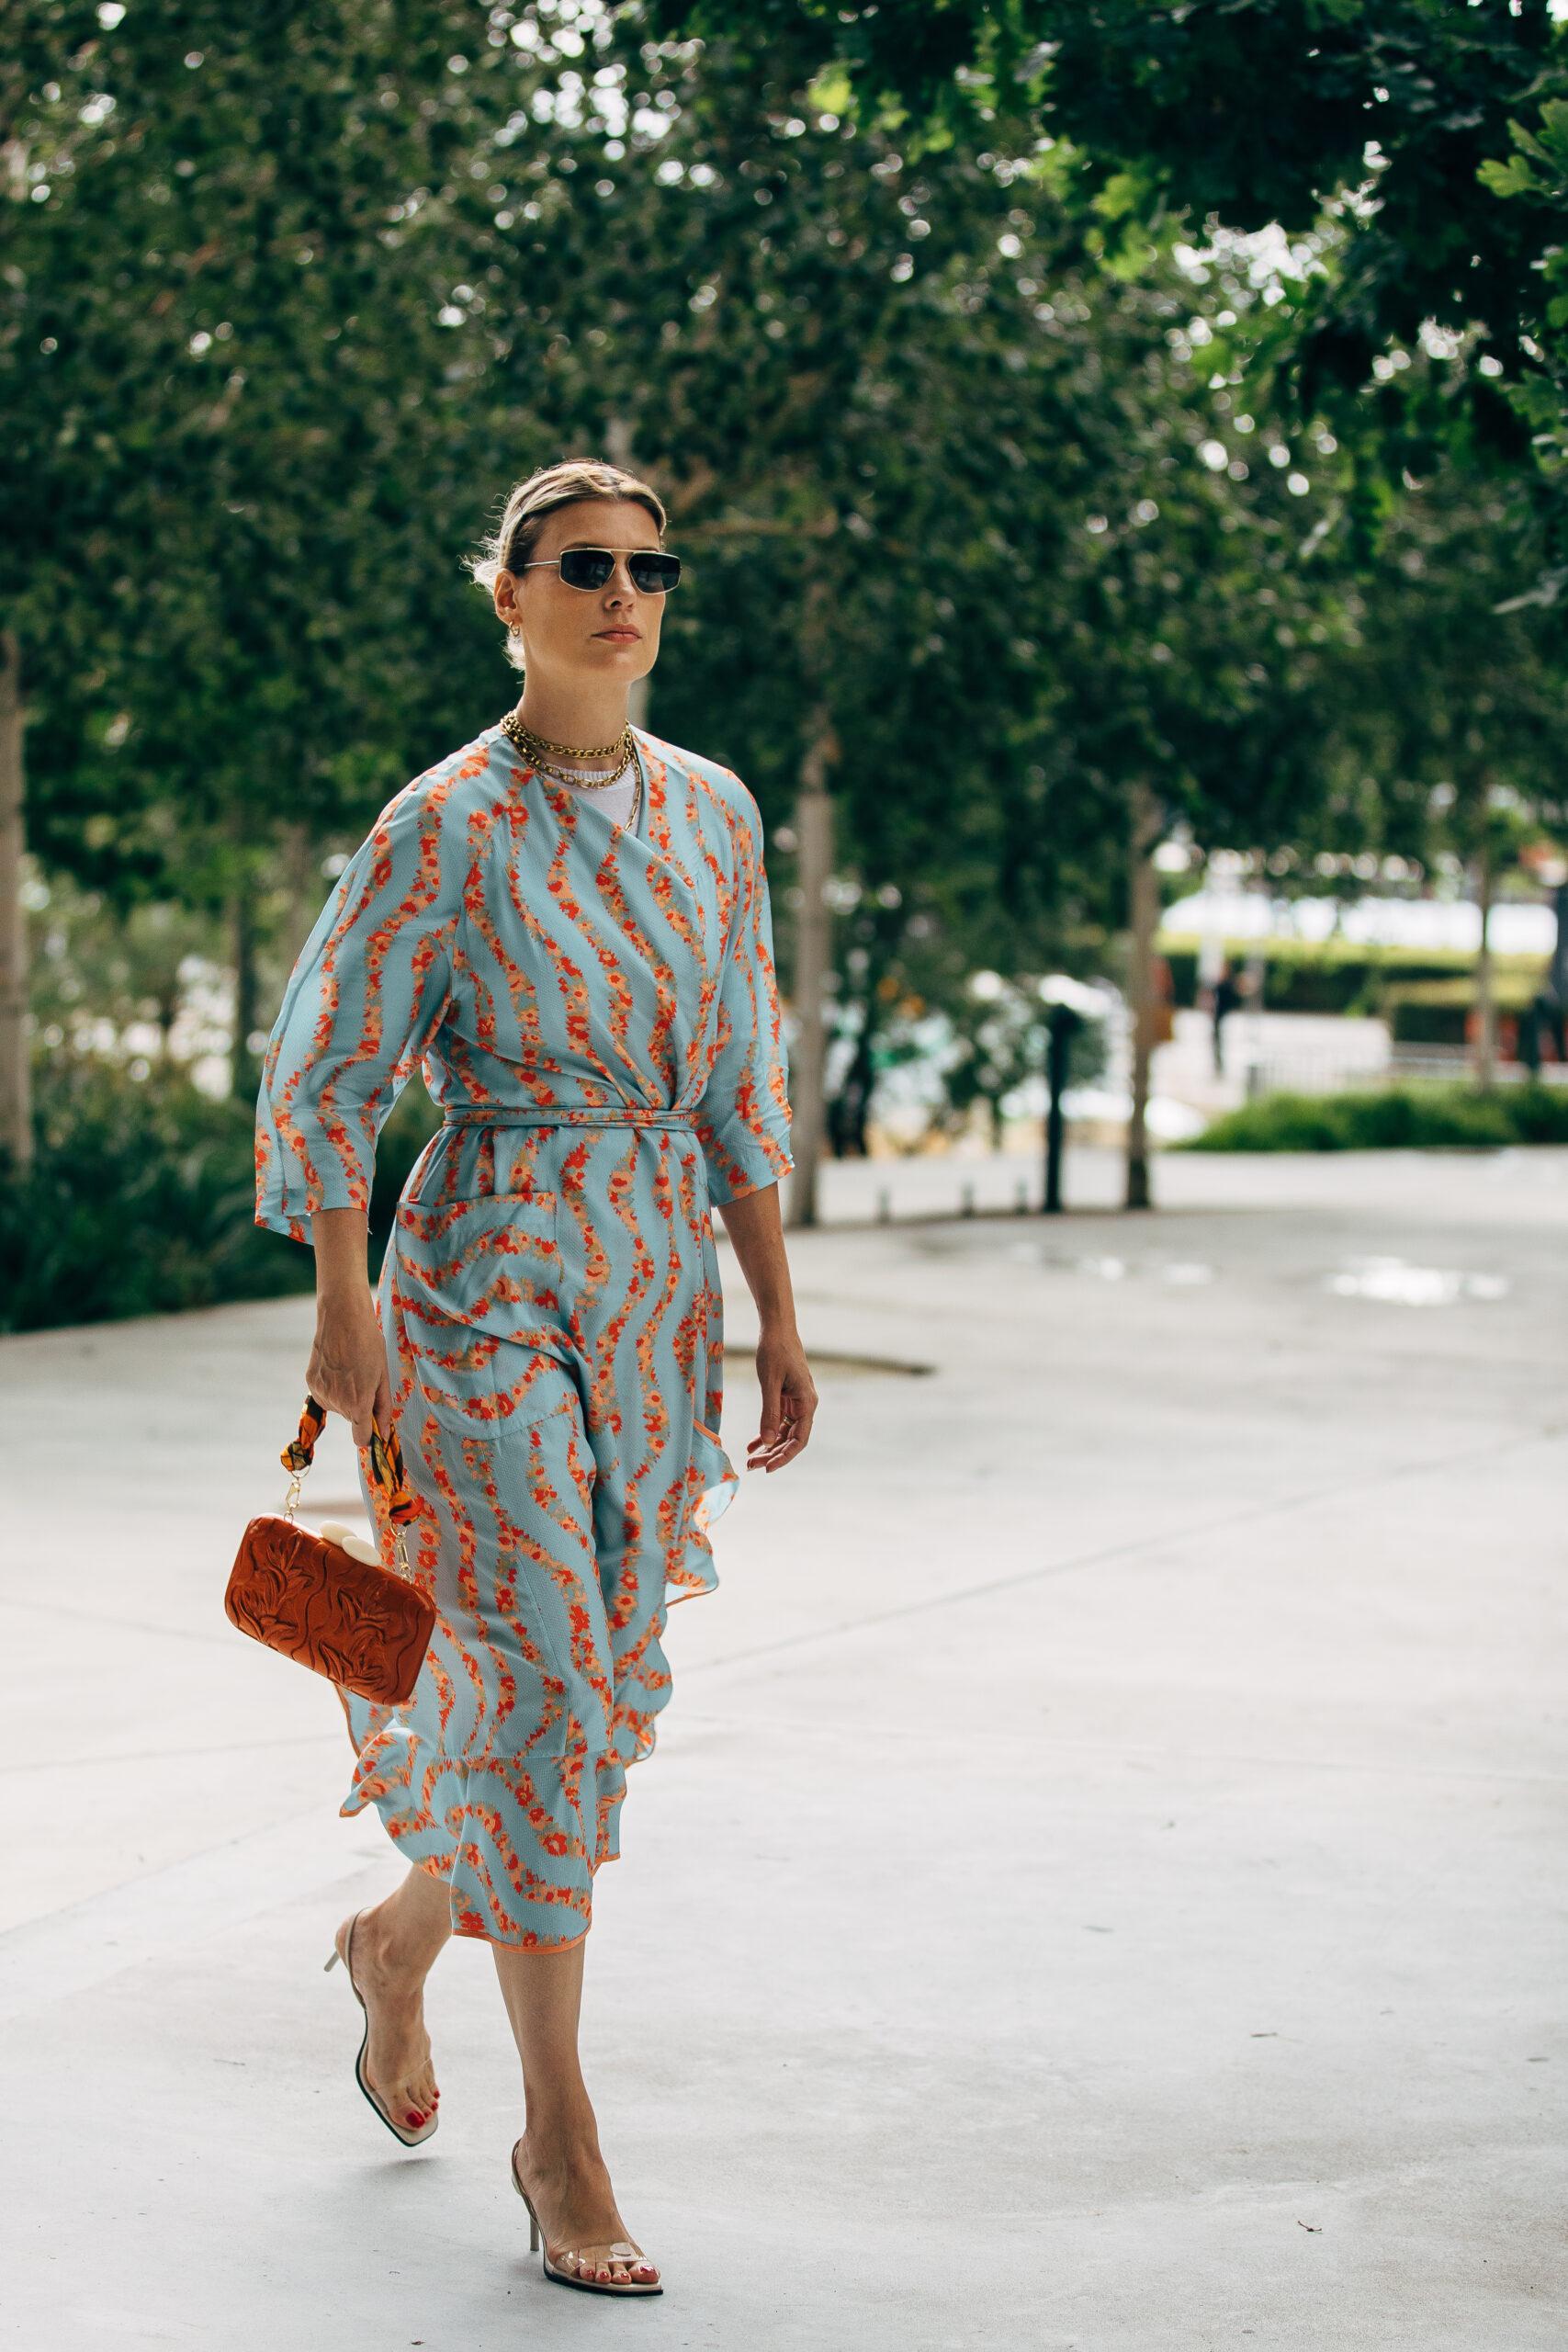 Modetrends zomer 2020. Lange zomerjurken